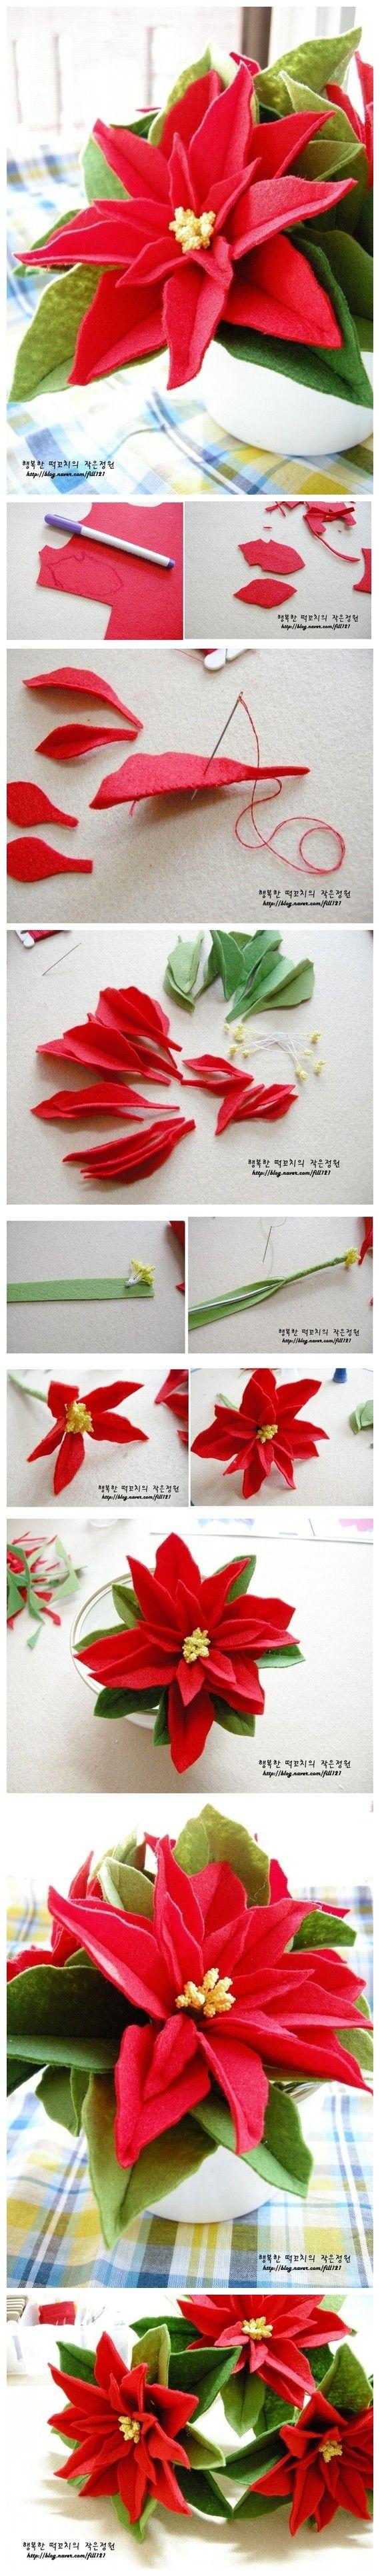 Flores Fieltro Flor De Pascua Costura De Navidad Manualidades Navidenas